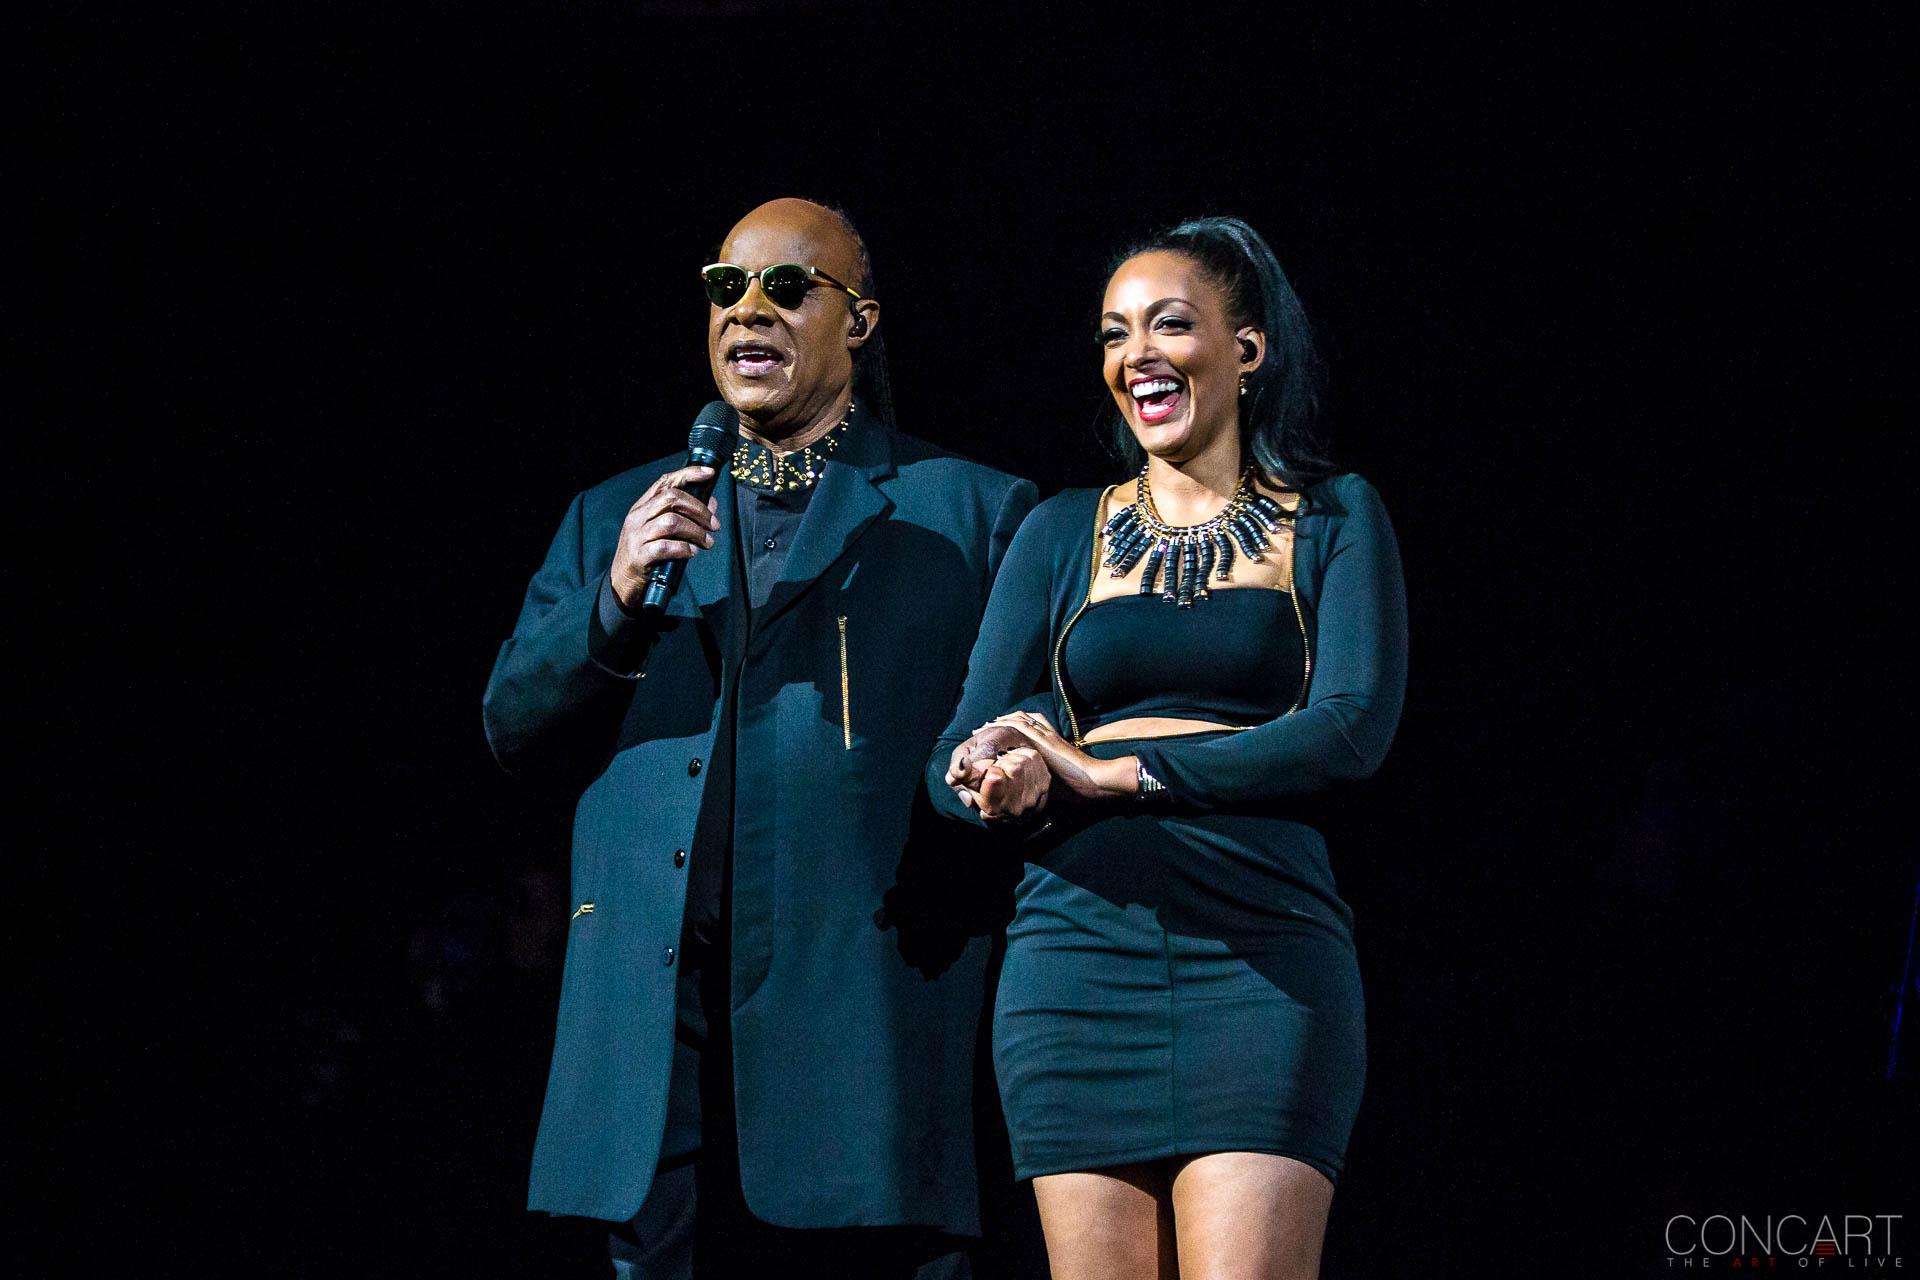 Stevie Wonder photo by Tyson White 1